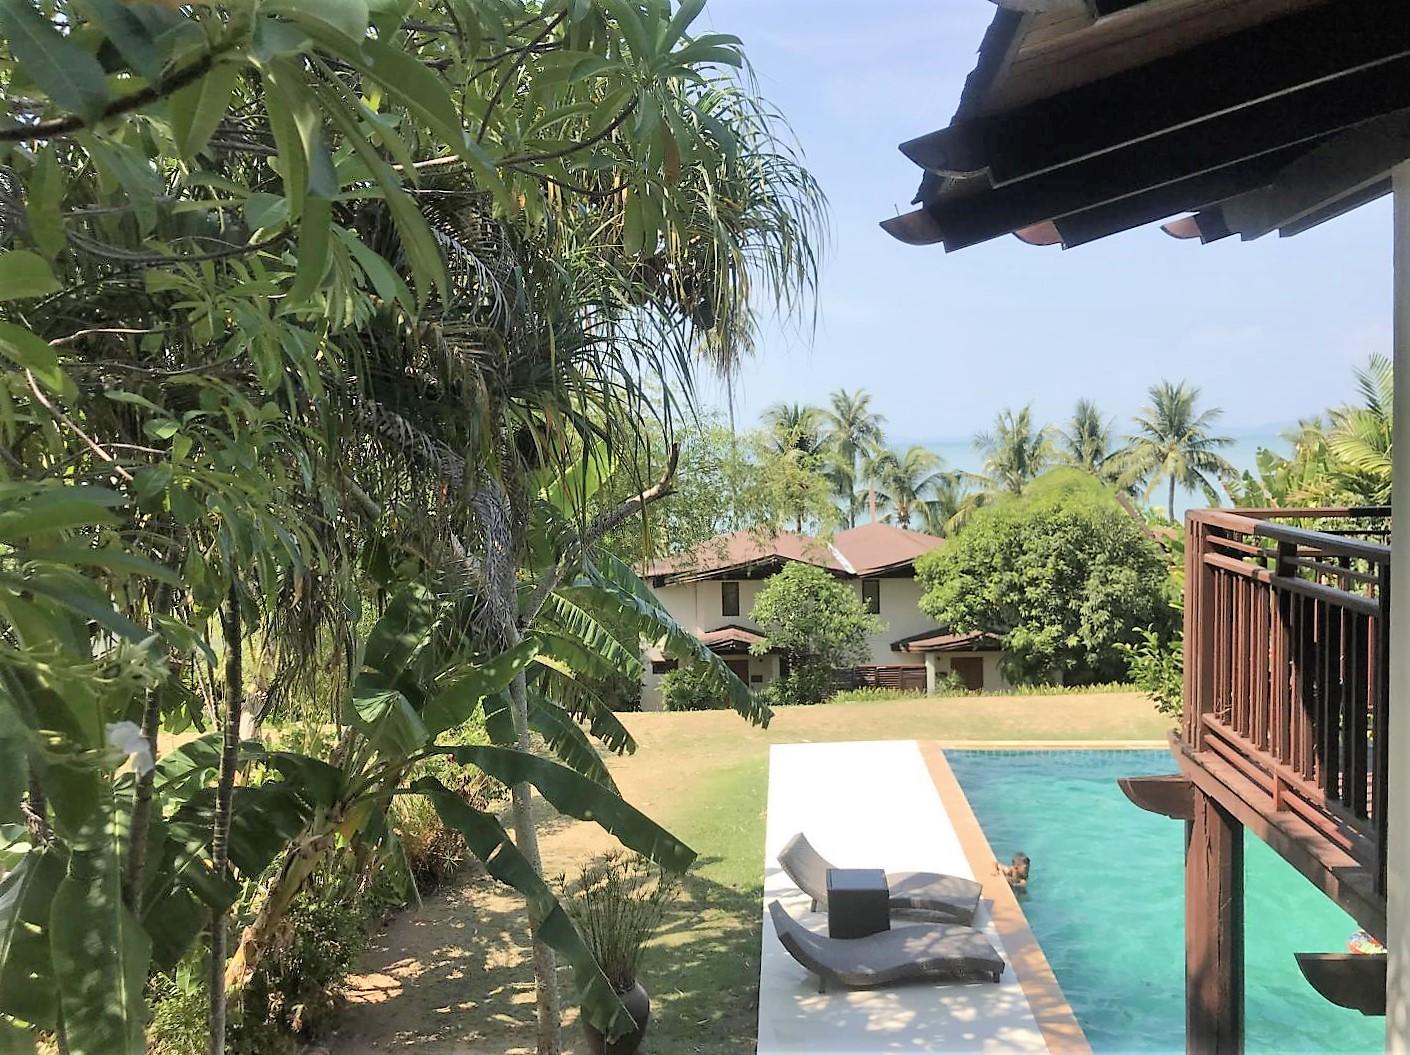 Sea View Villa, Coconut Island, Phuket V27, 2 Bed